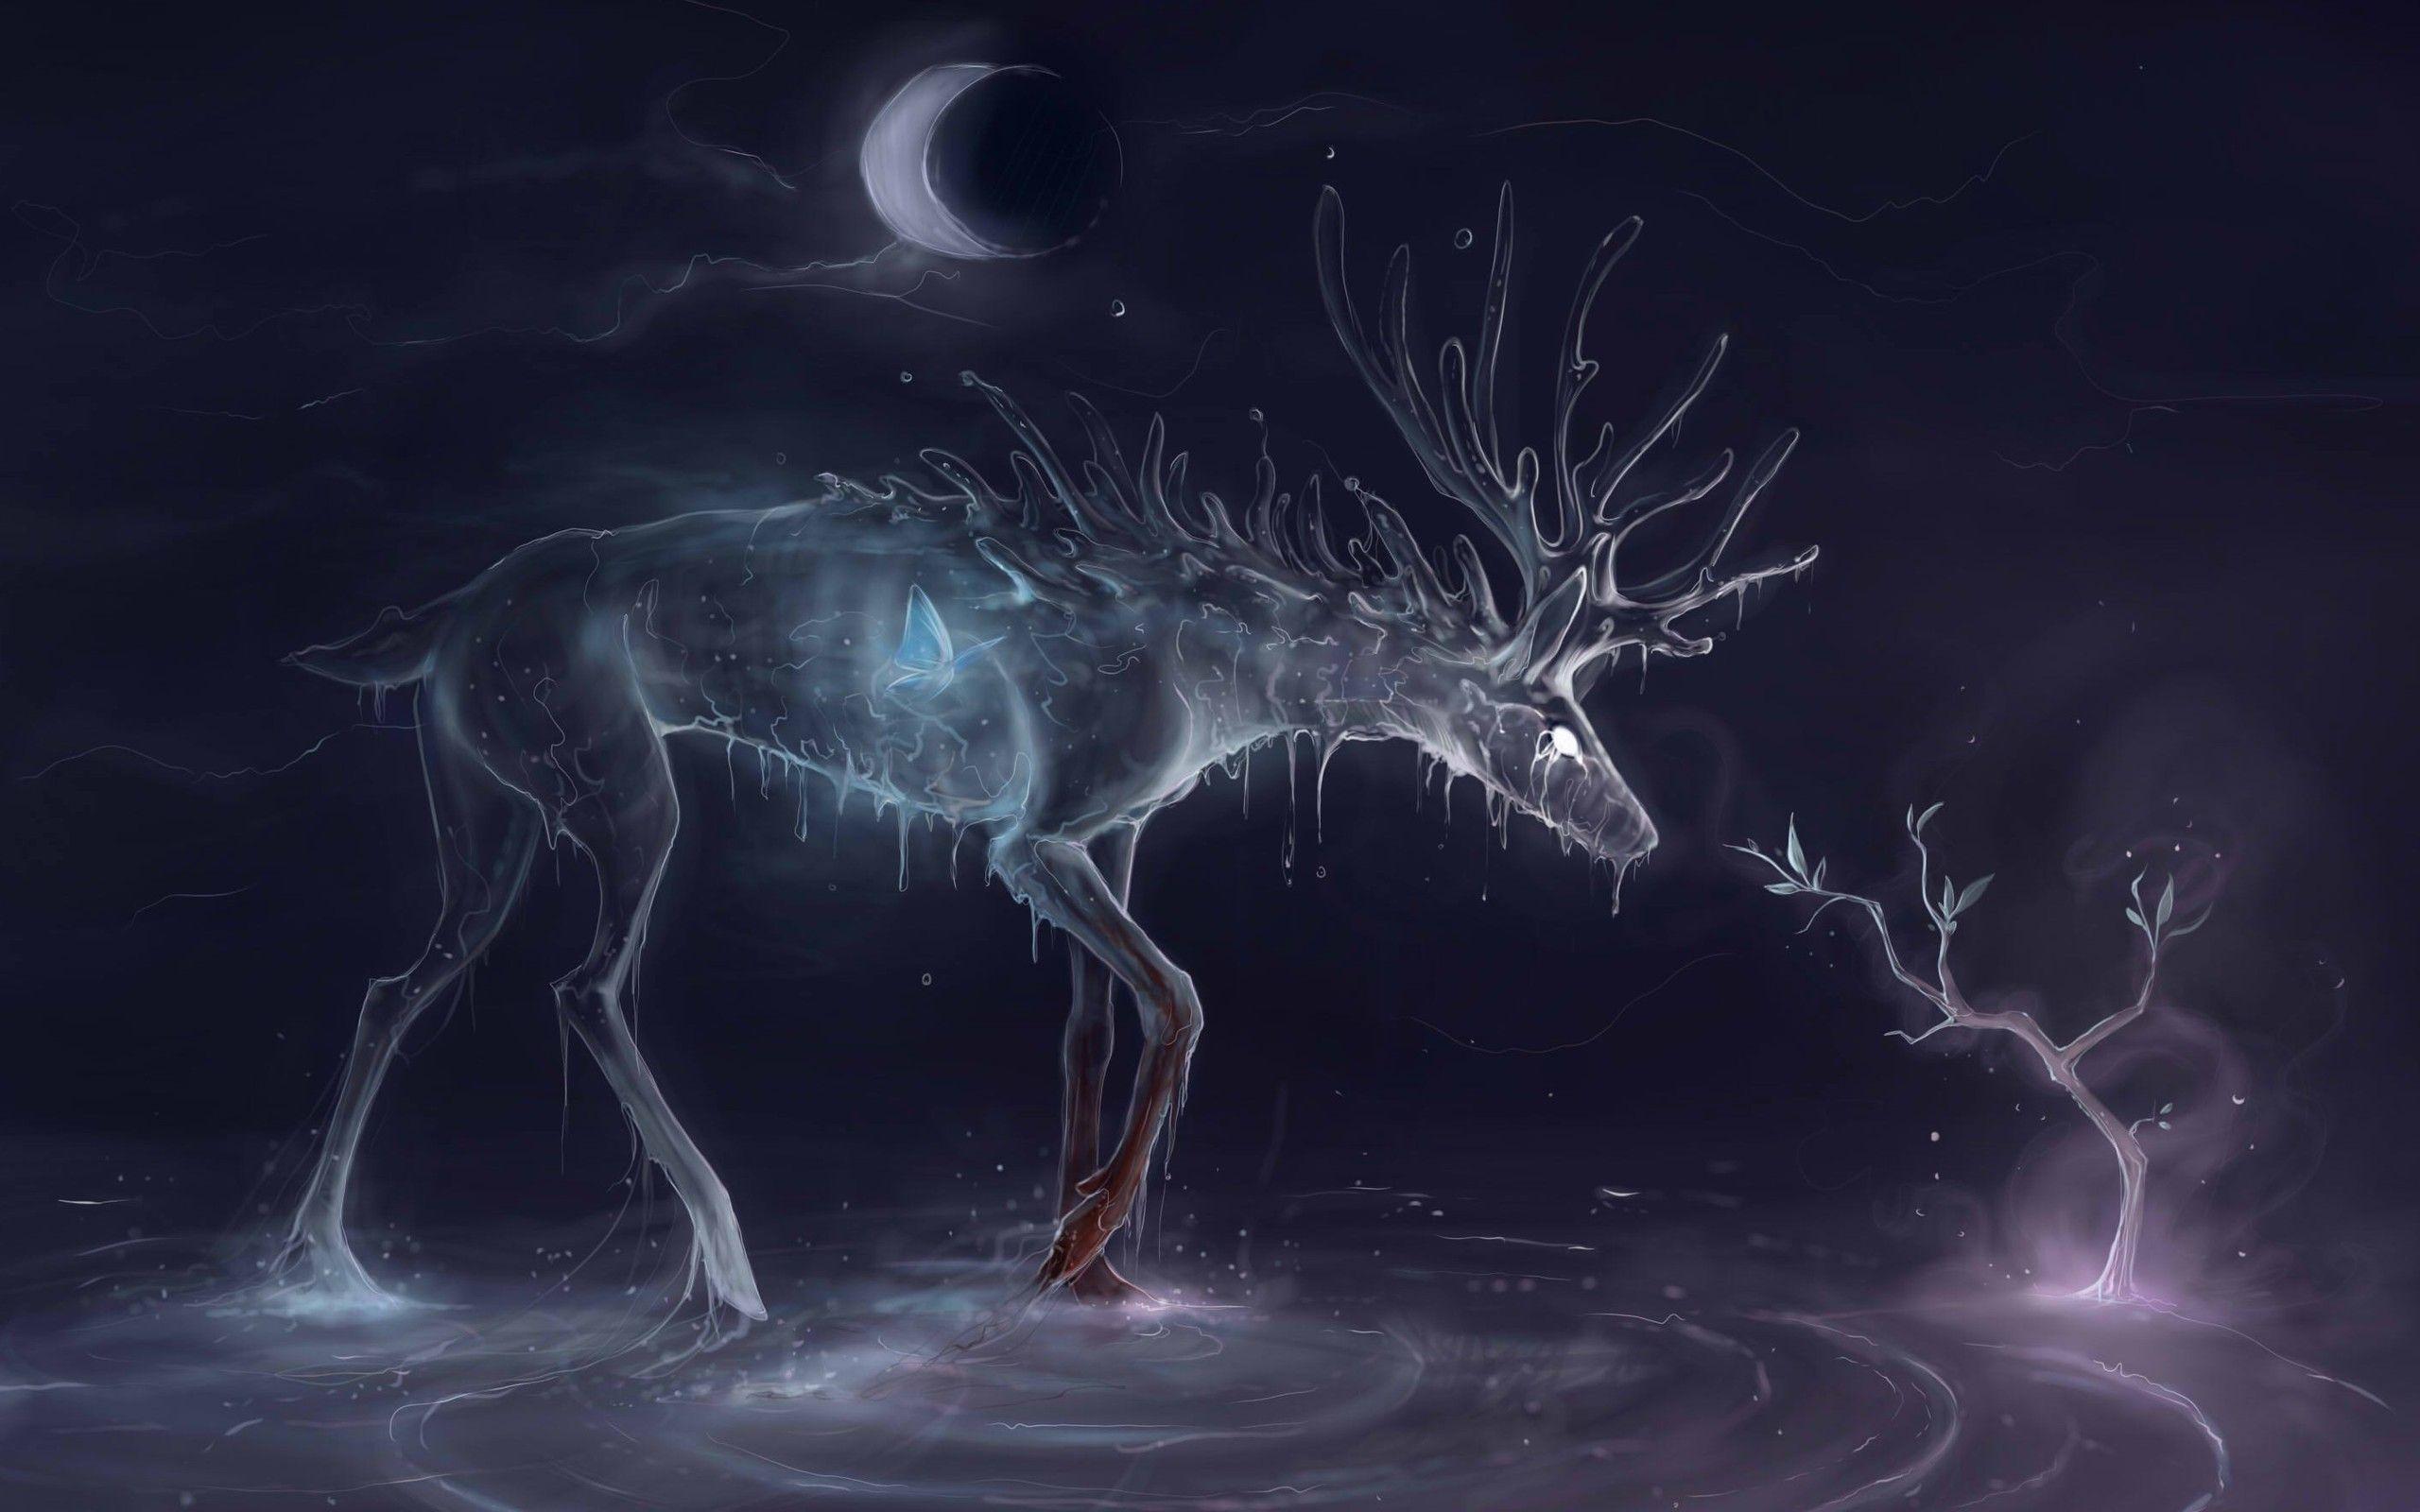 deer images hd